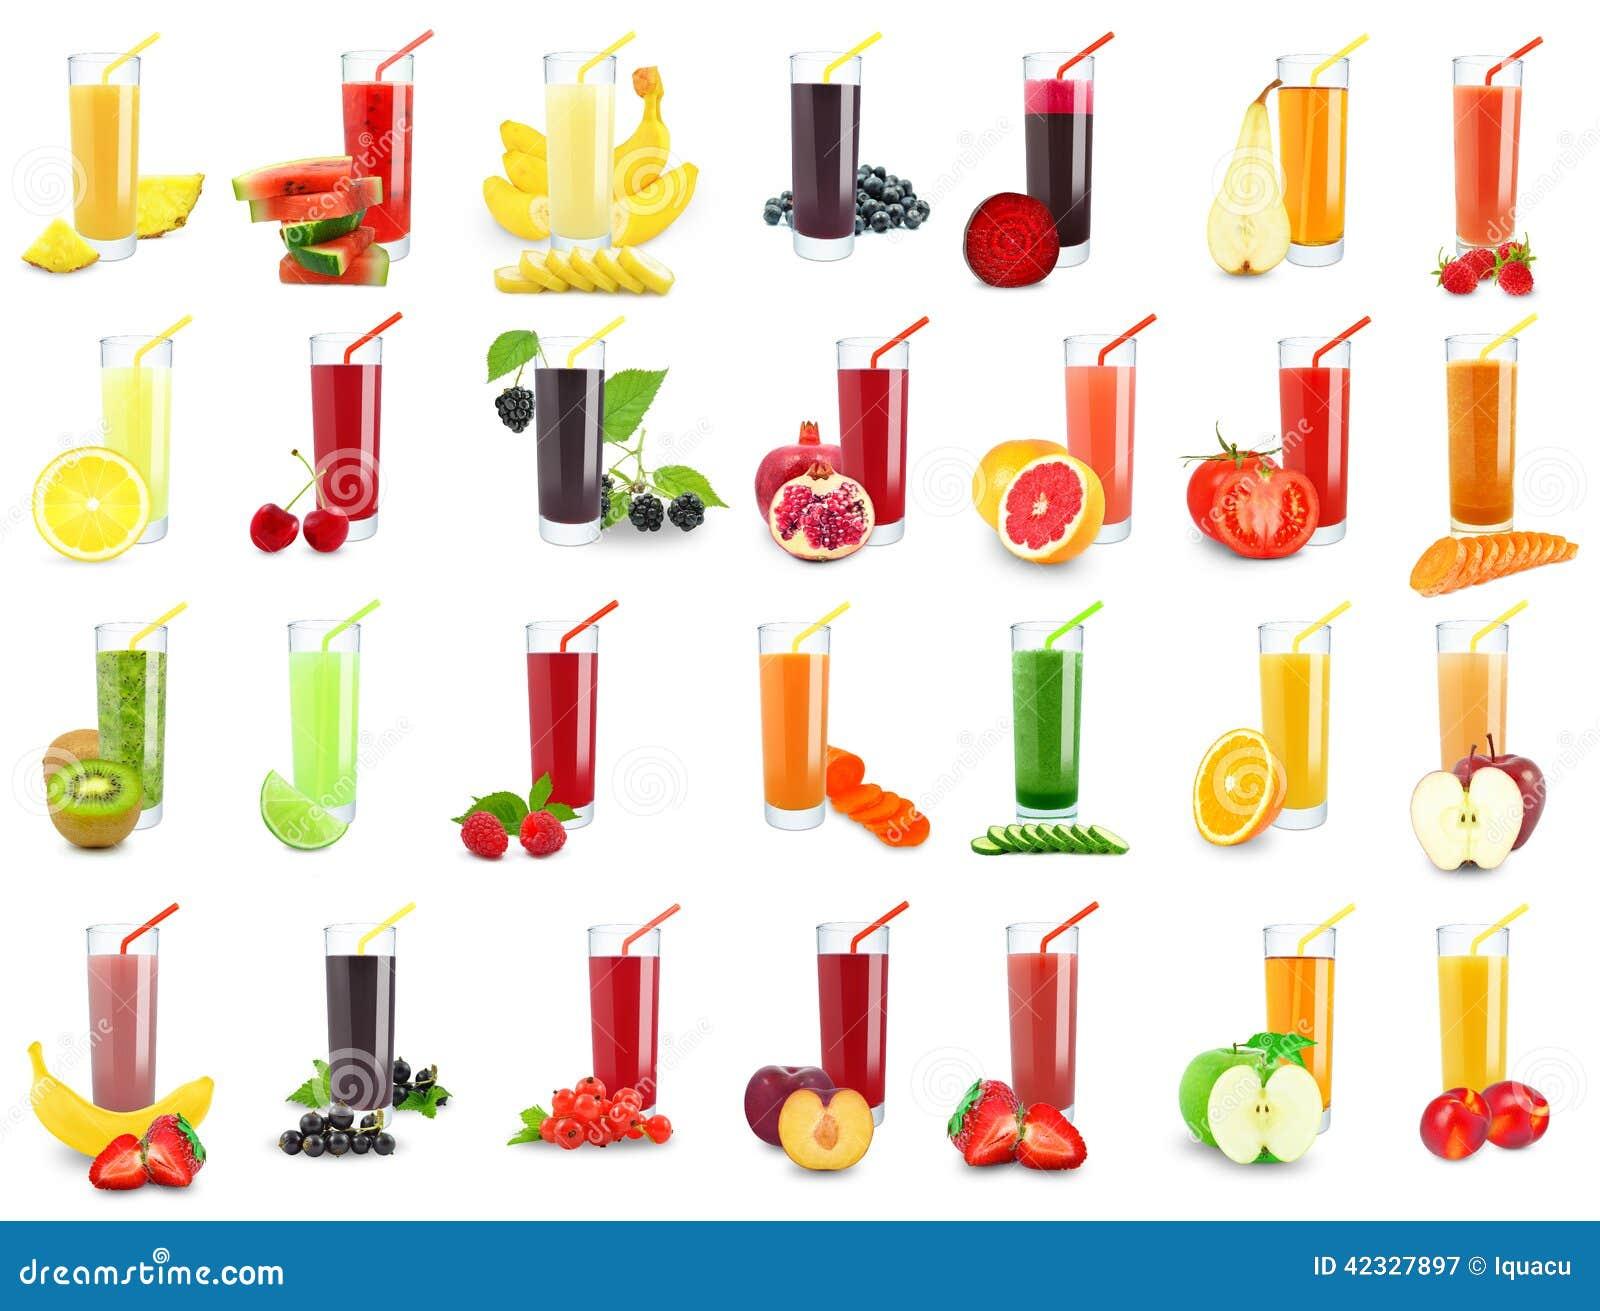 Juices Stock Photo Image 42327897